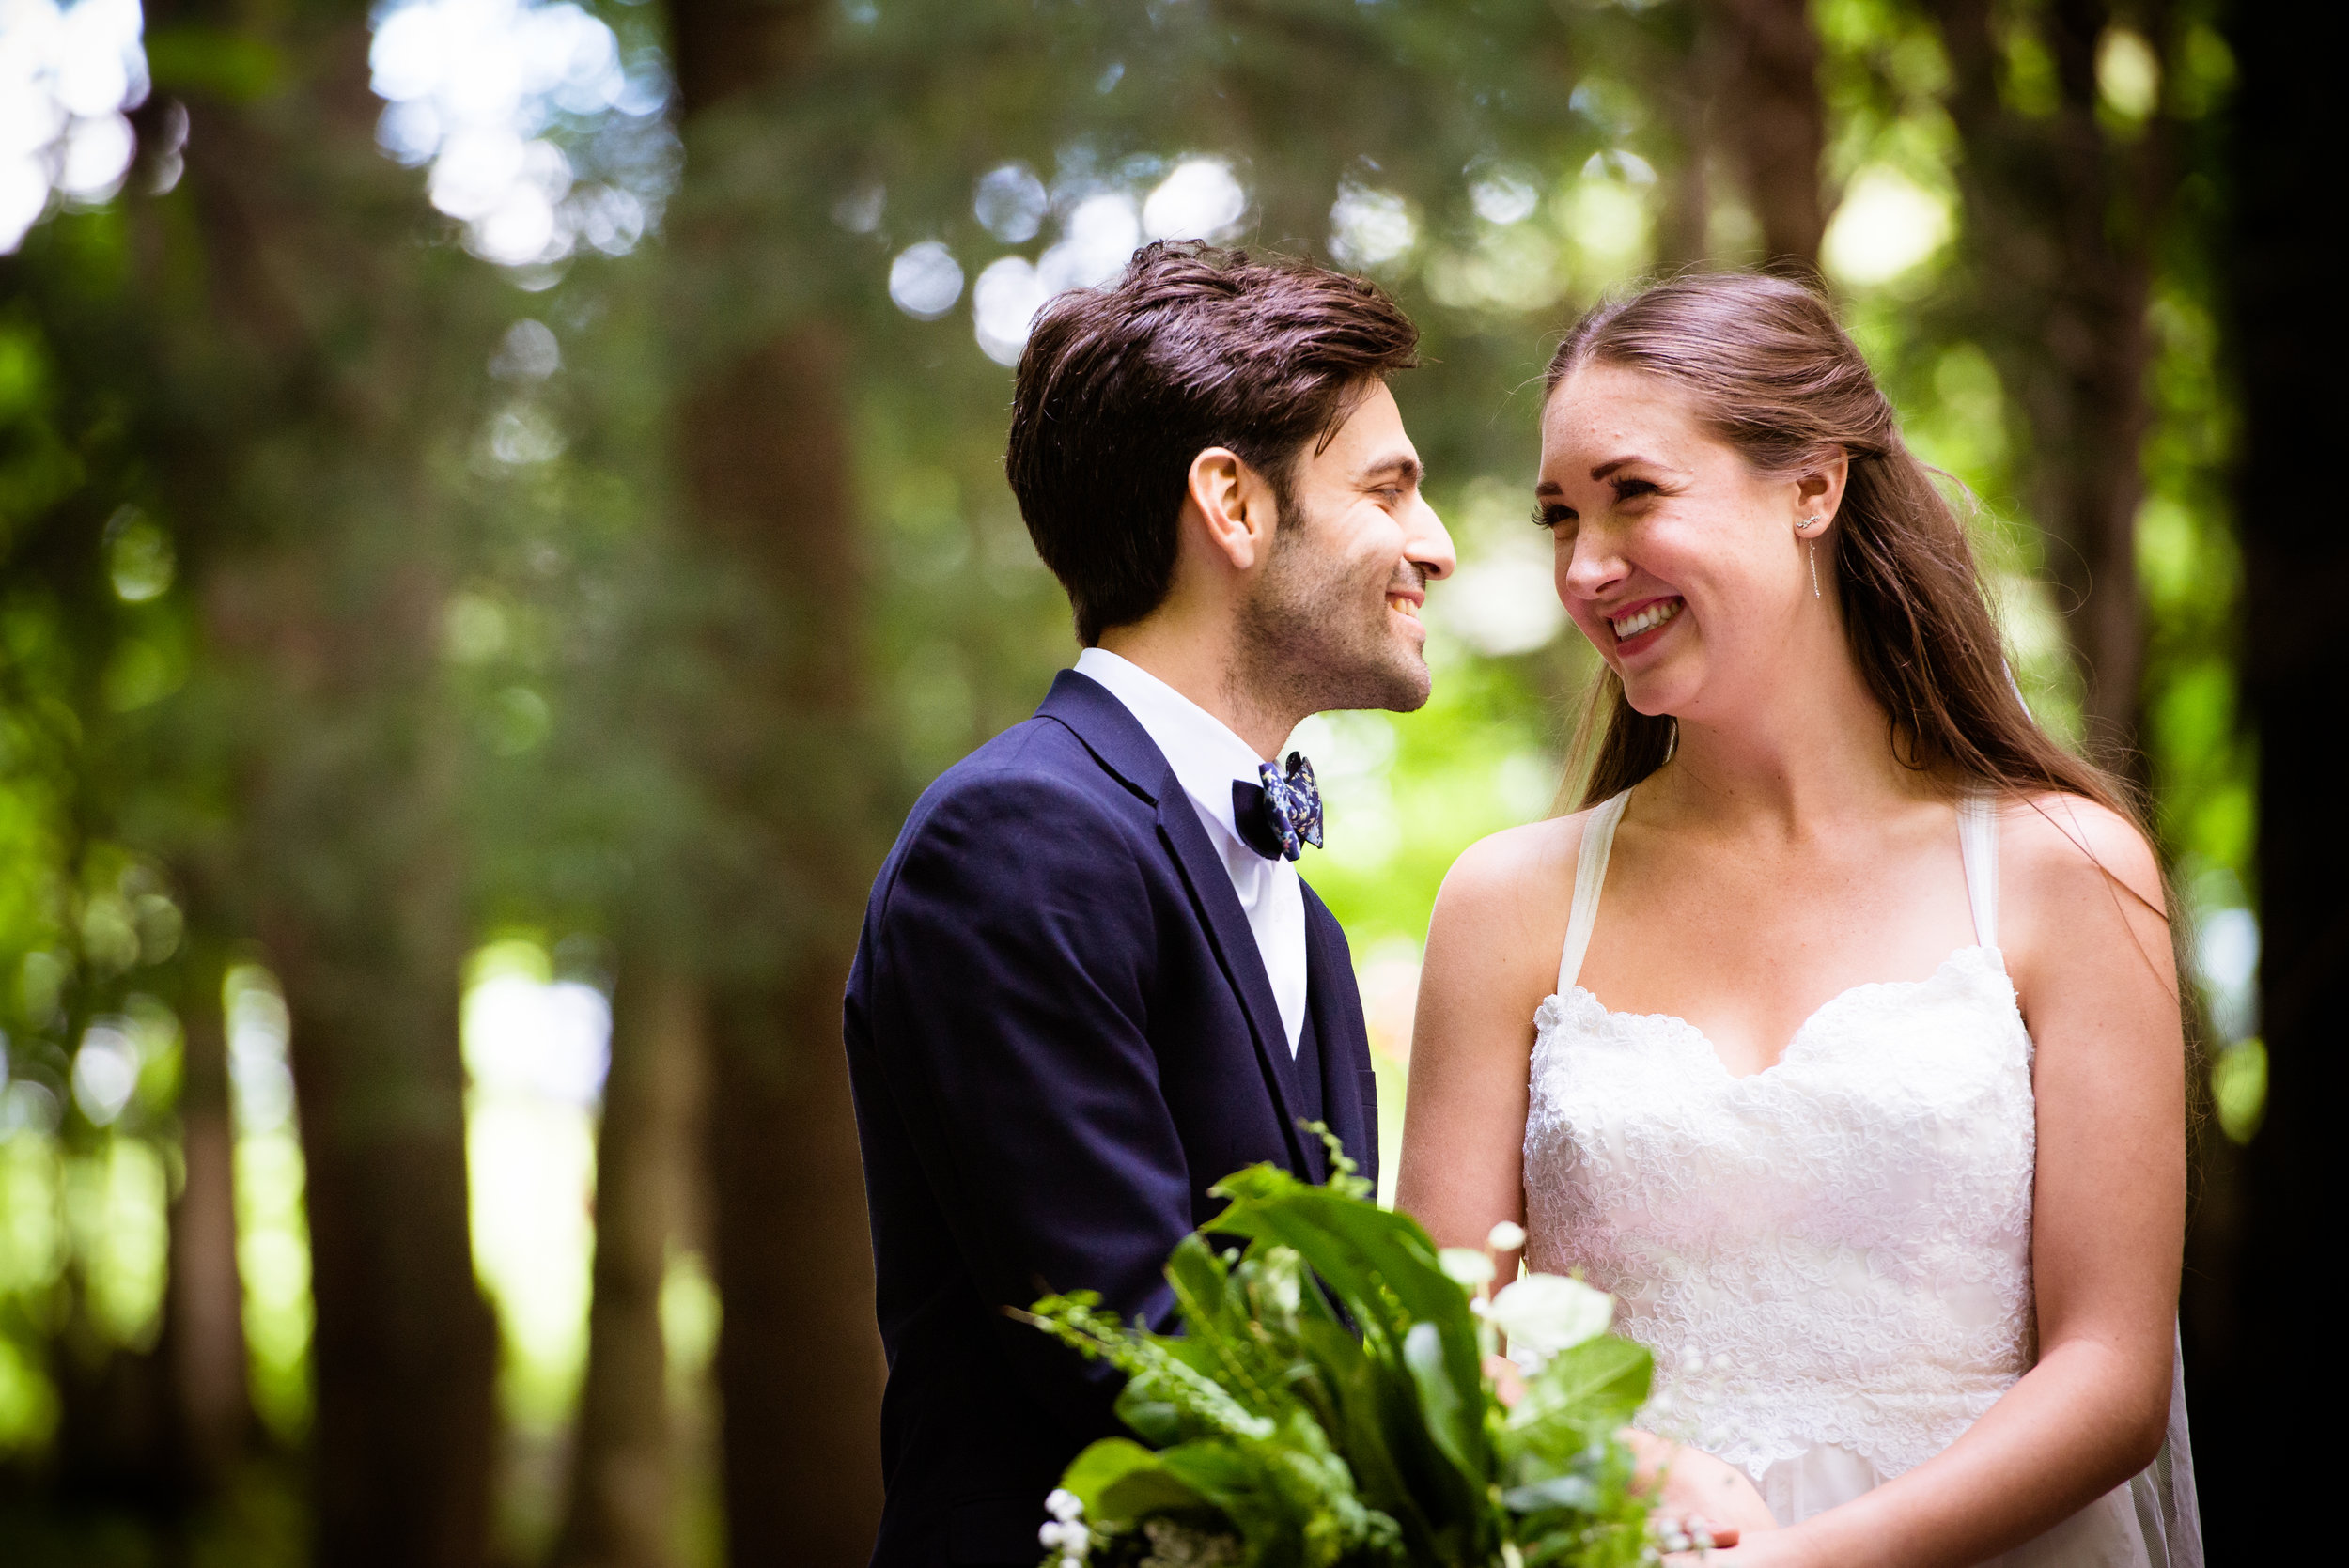 Post ceremony bliss. // Plant Based Bride // Shot by Karmel Kreative